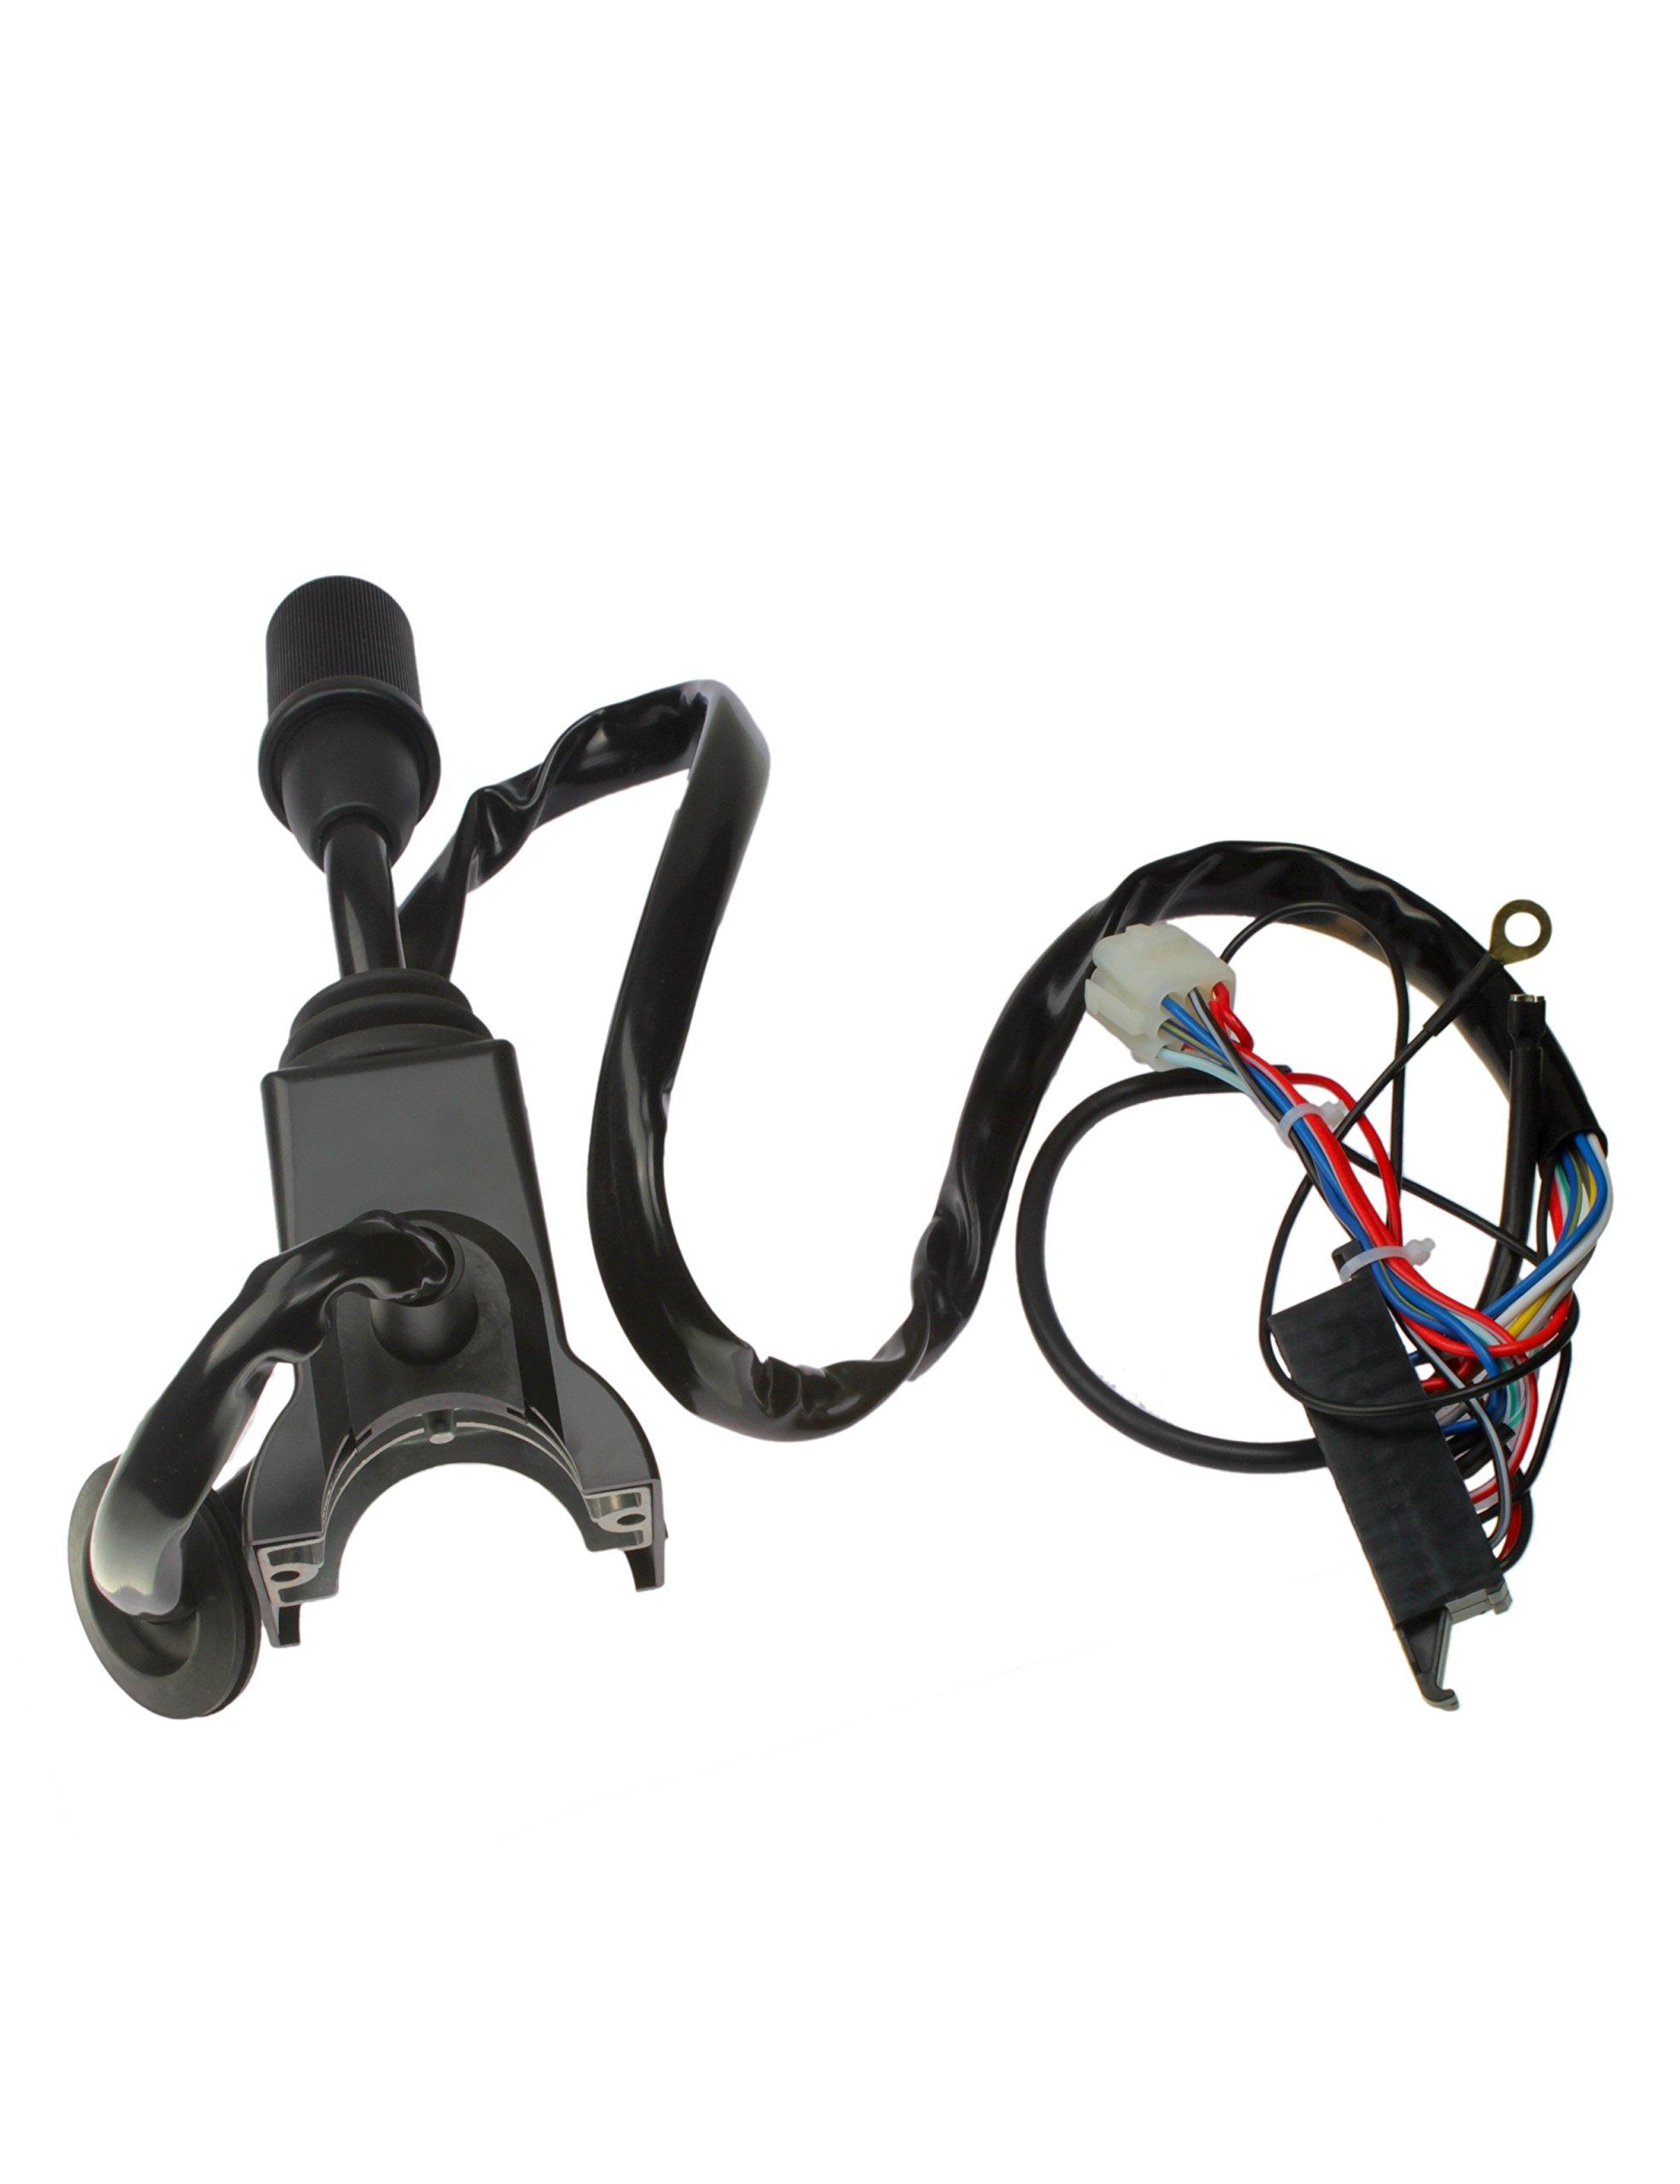 Switch VOE11039407 11039407 for Volvo 4400 4500 6300 4200B 4300B 4600B EL70  VOLVO BM L120 L160 L30 L50 L70 L90